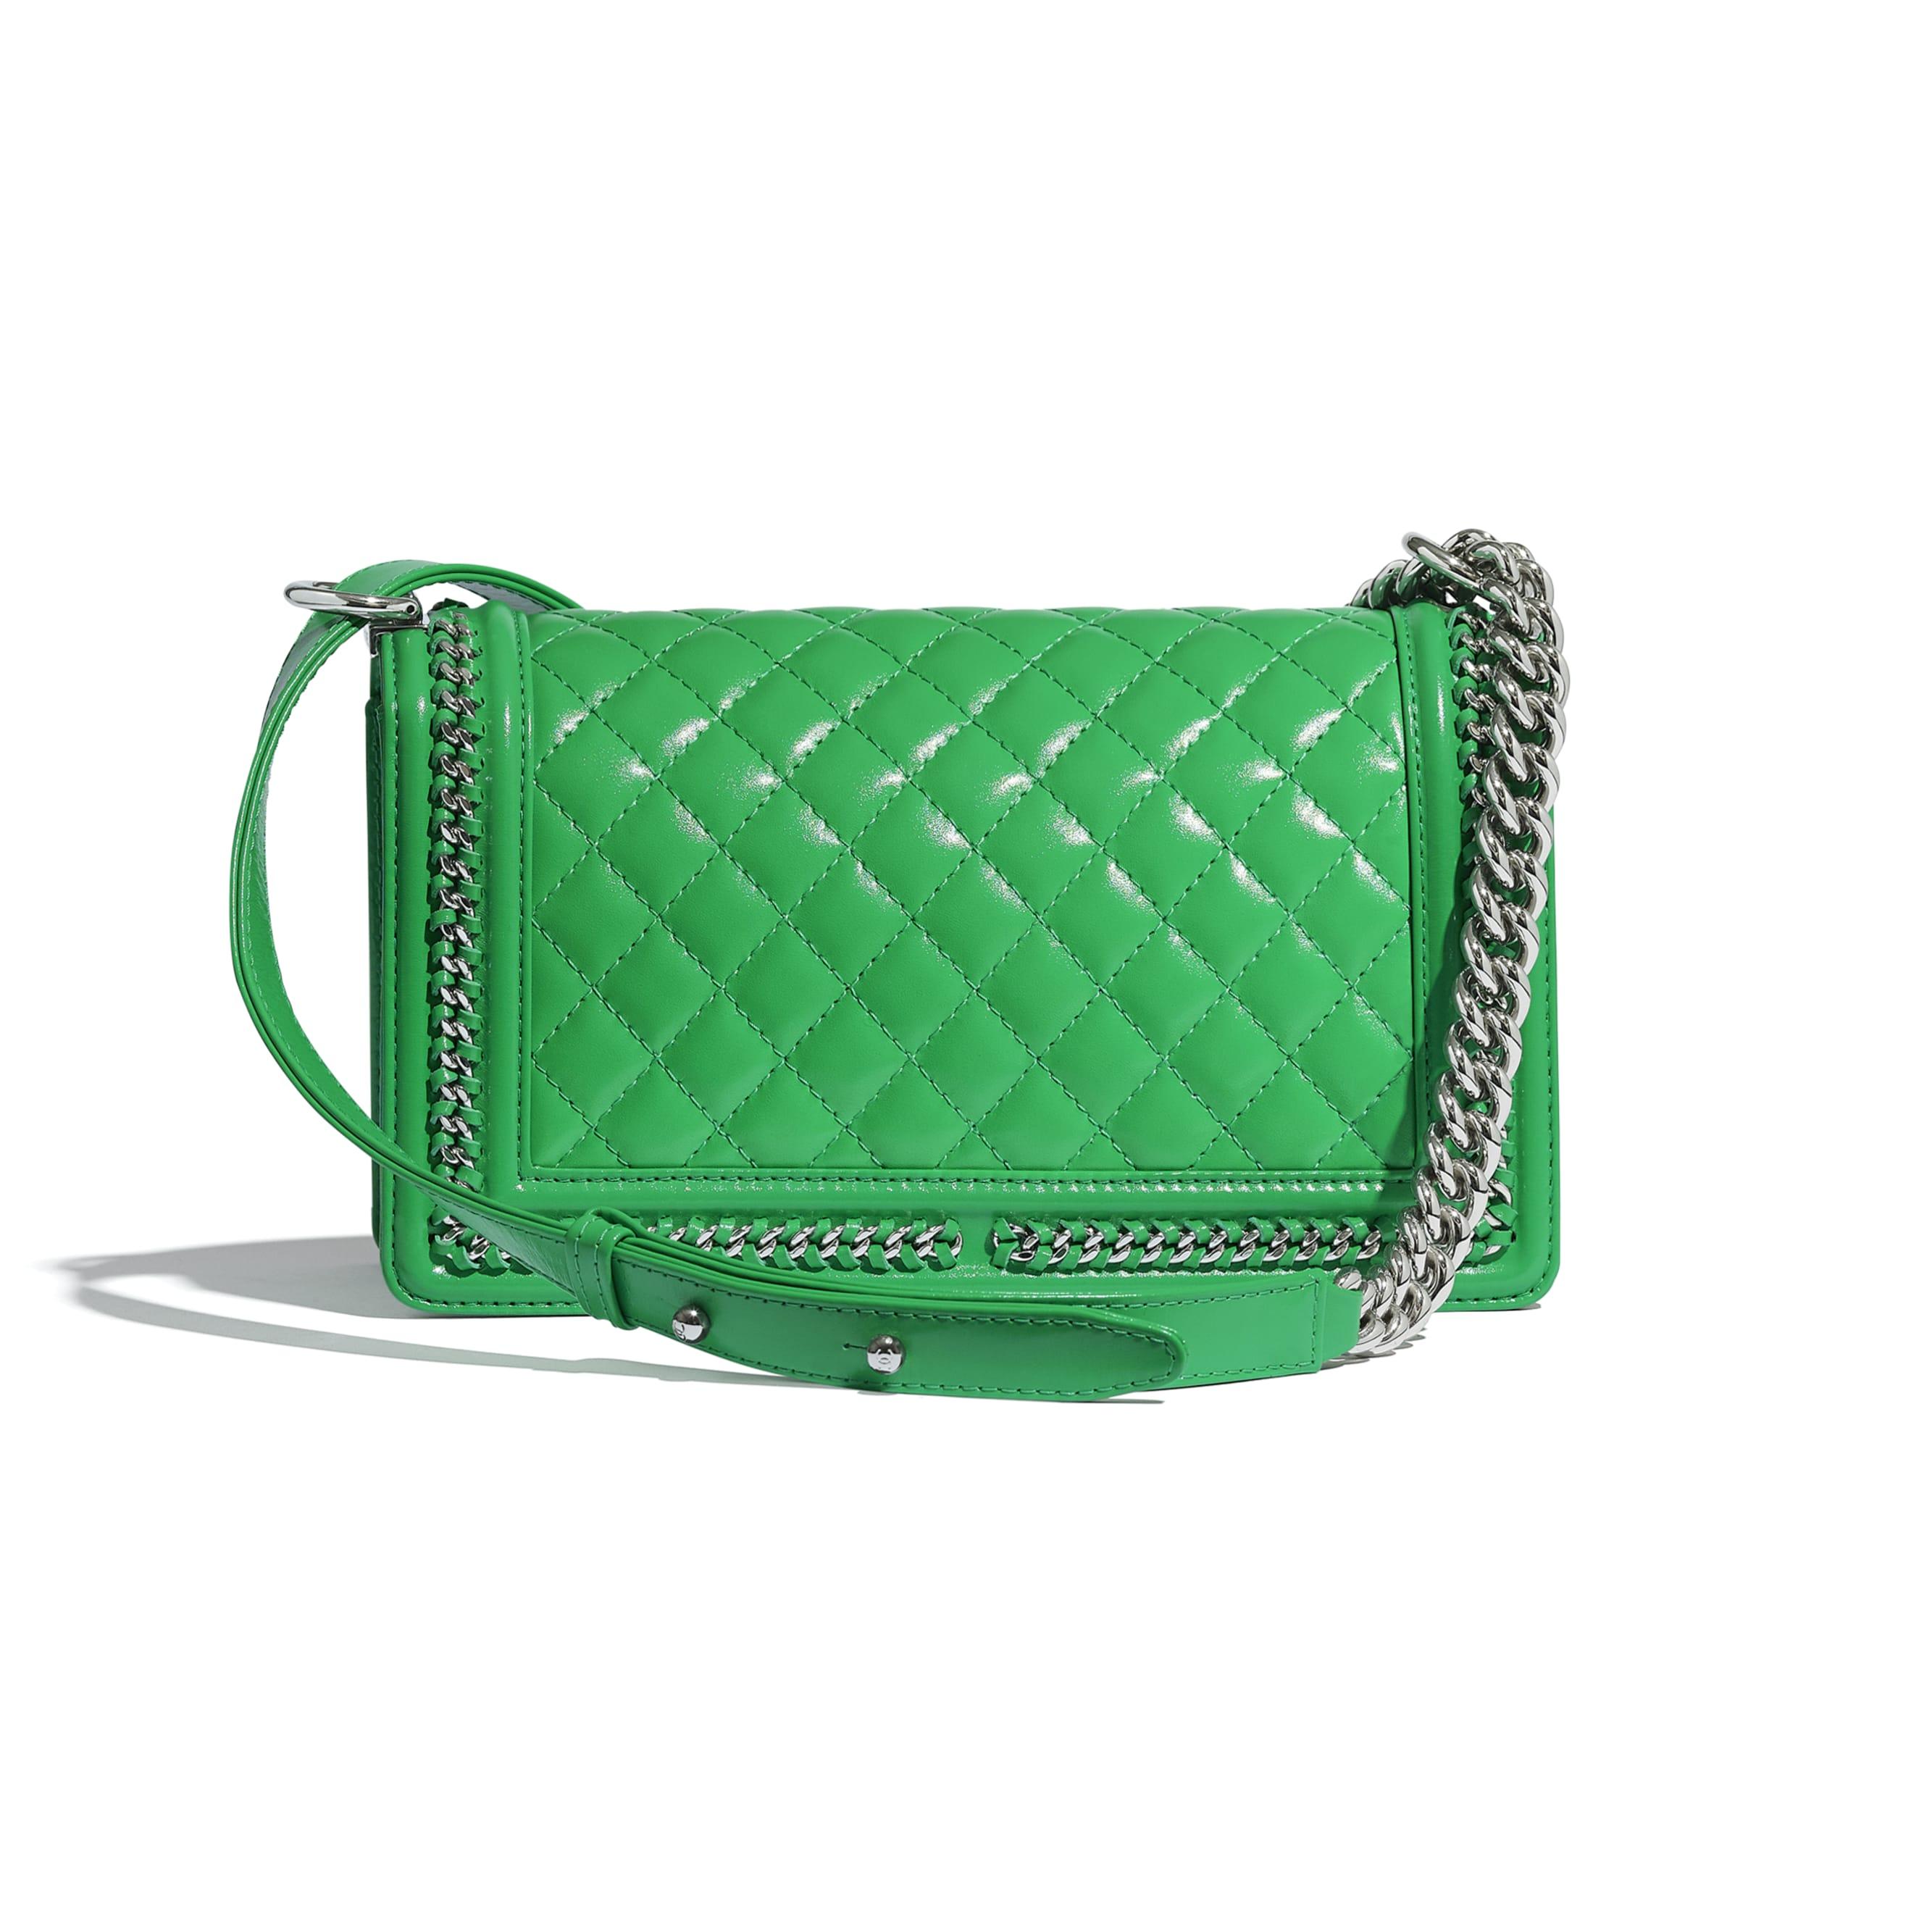 BOY CHANEL Handbag - Green - Calfskin & Gold-Tone Metal - Alternative view - see standard sized version